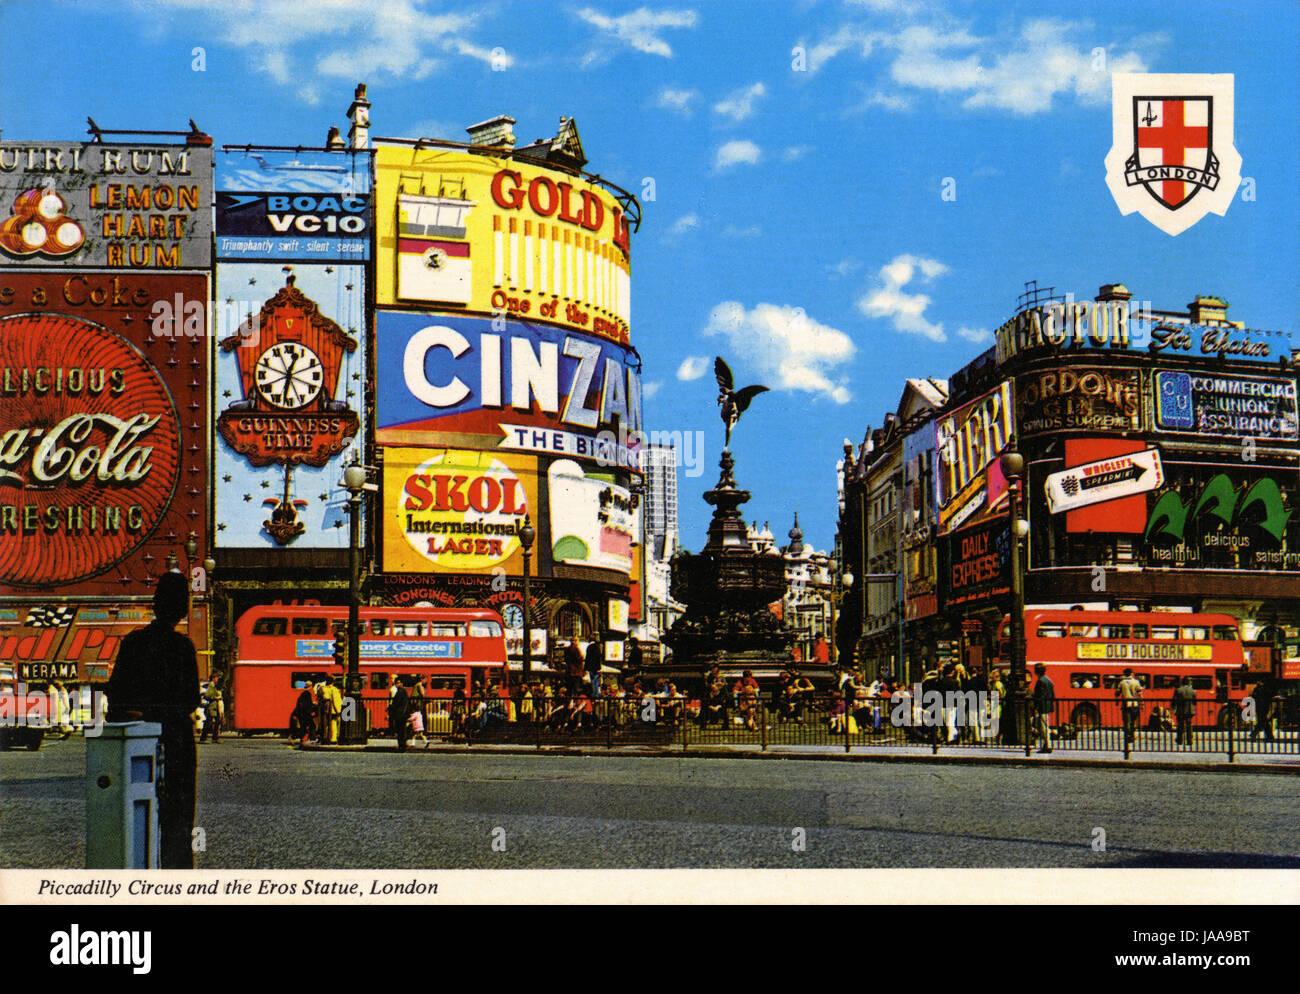 Postcard of Picaddilly Circus, London - Stock Image